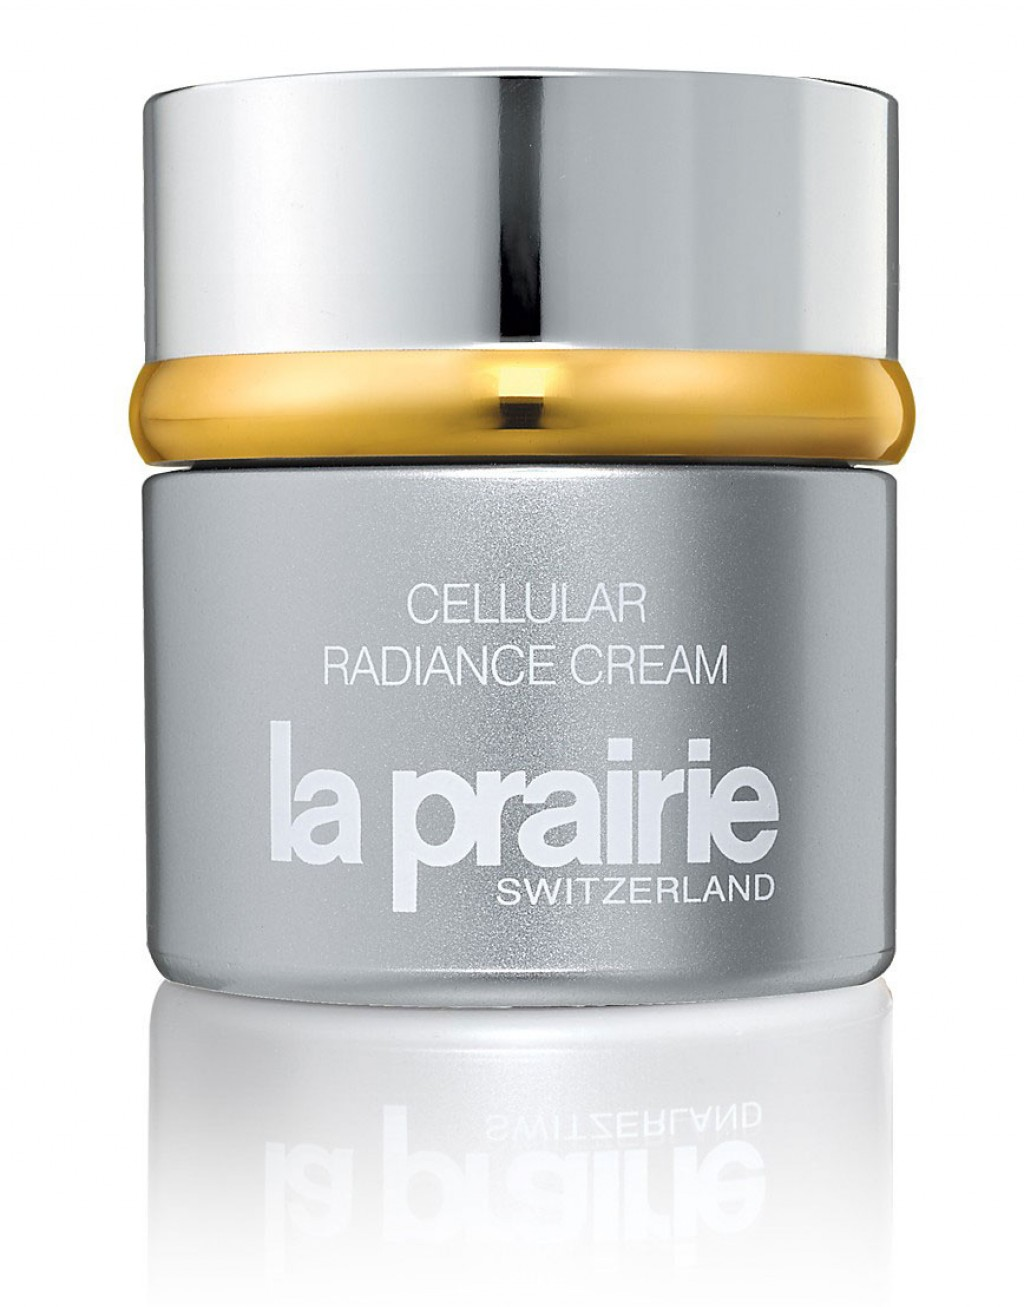 La Prairie Cellular Radiance Cream Skin Care Beautyalmanac